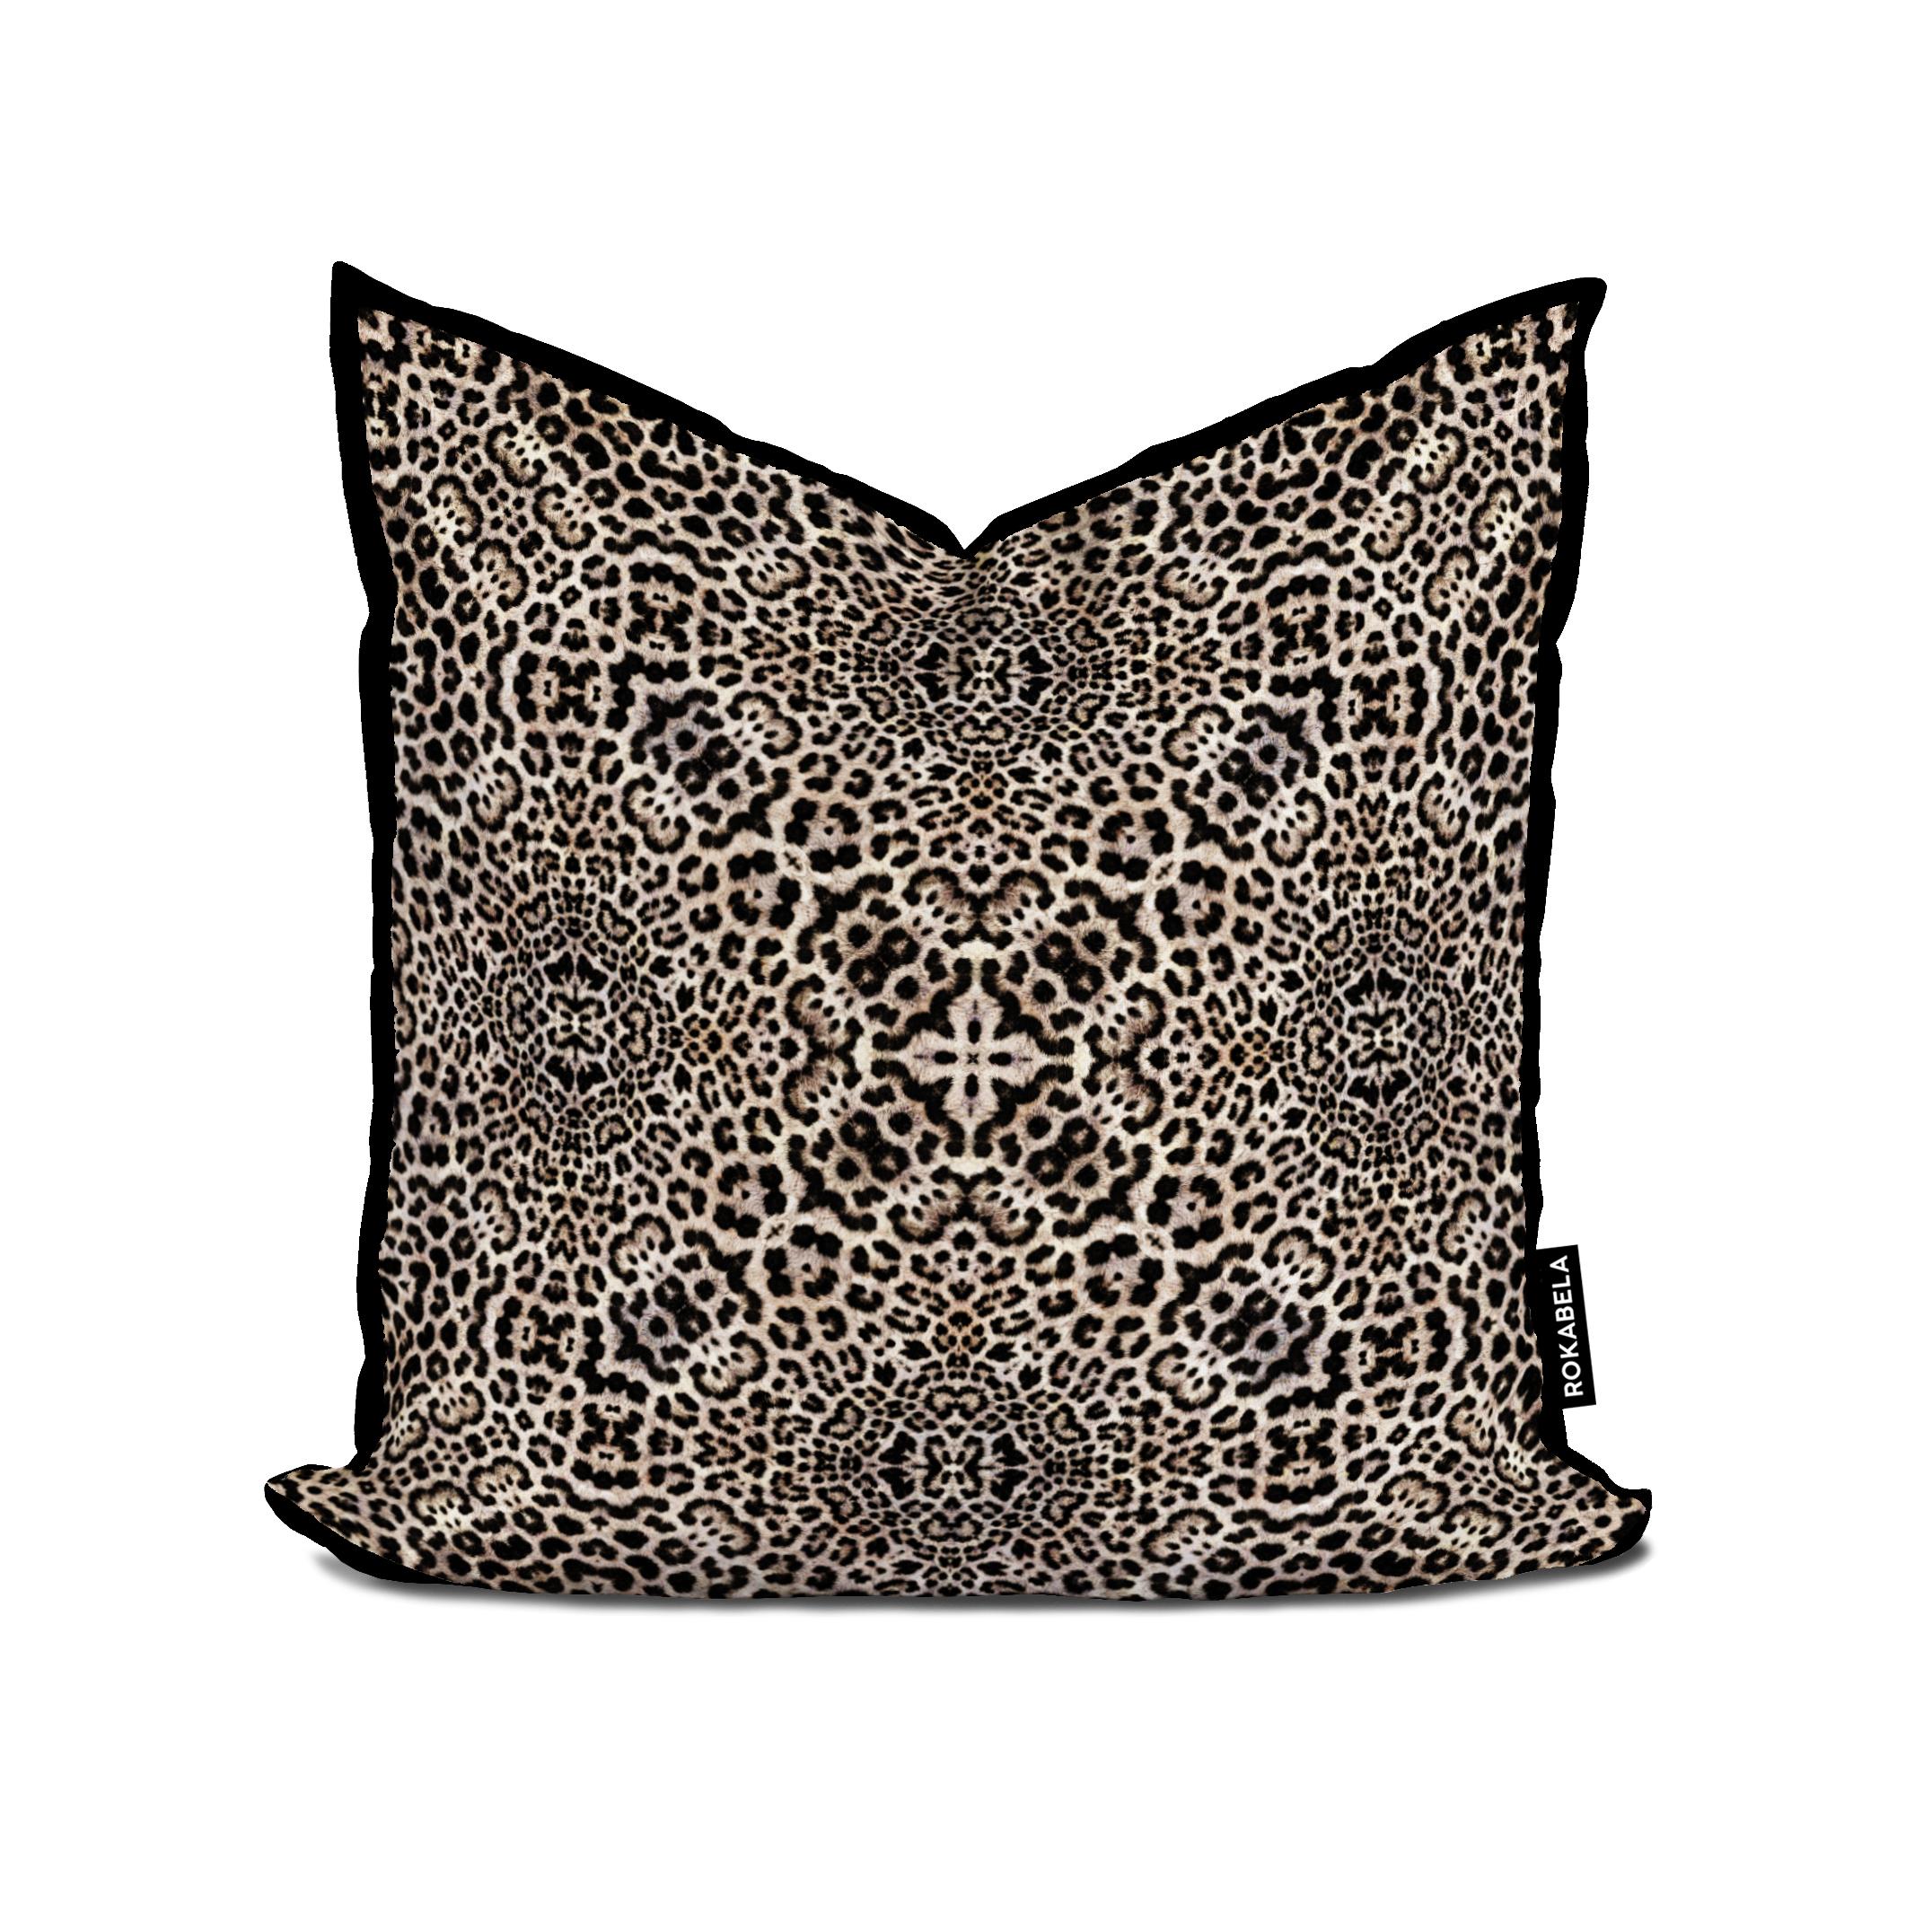 Rokabela Persian Leopard Cub Cushion — ROKABELA.